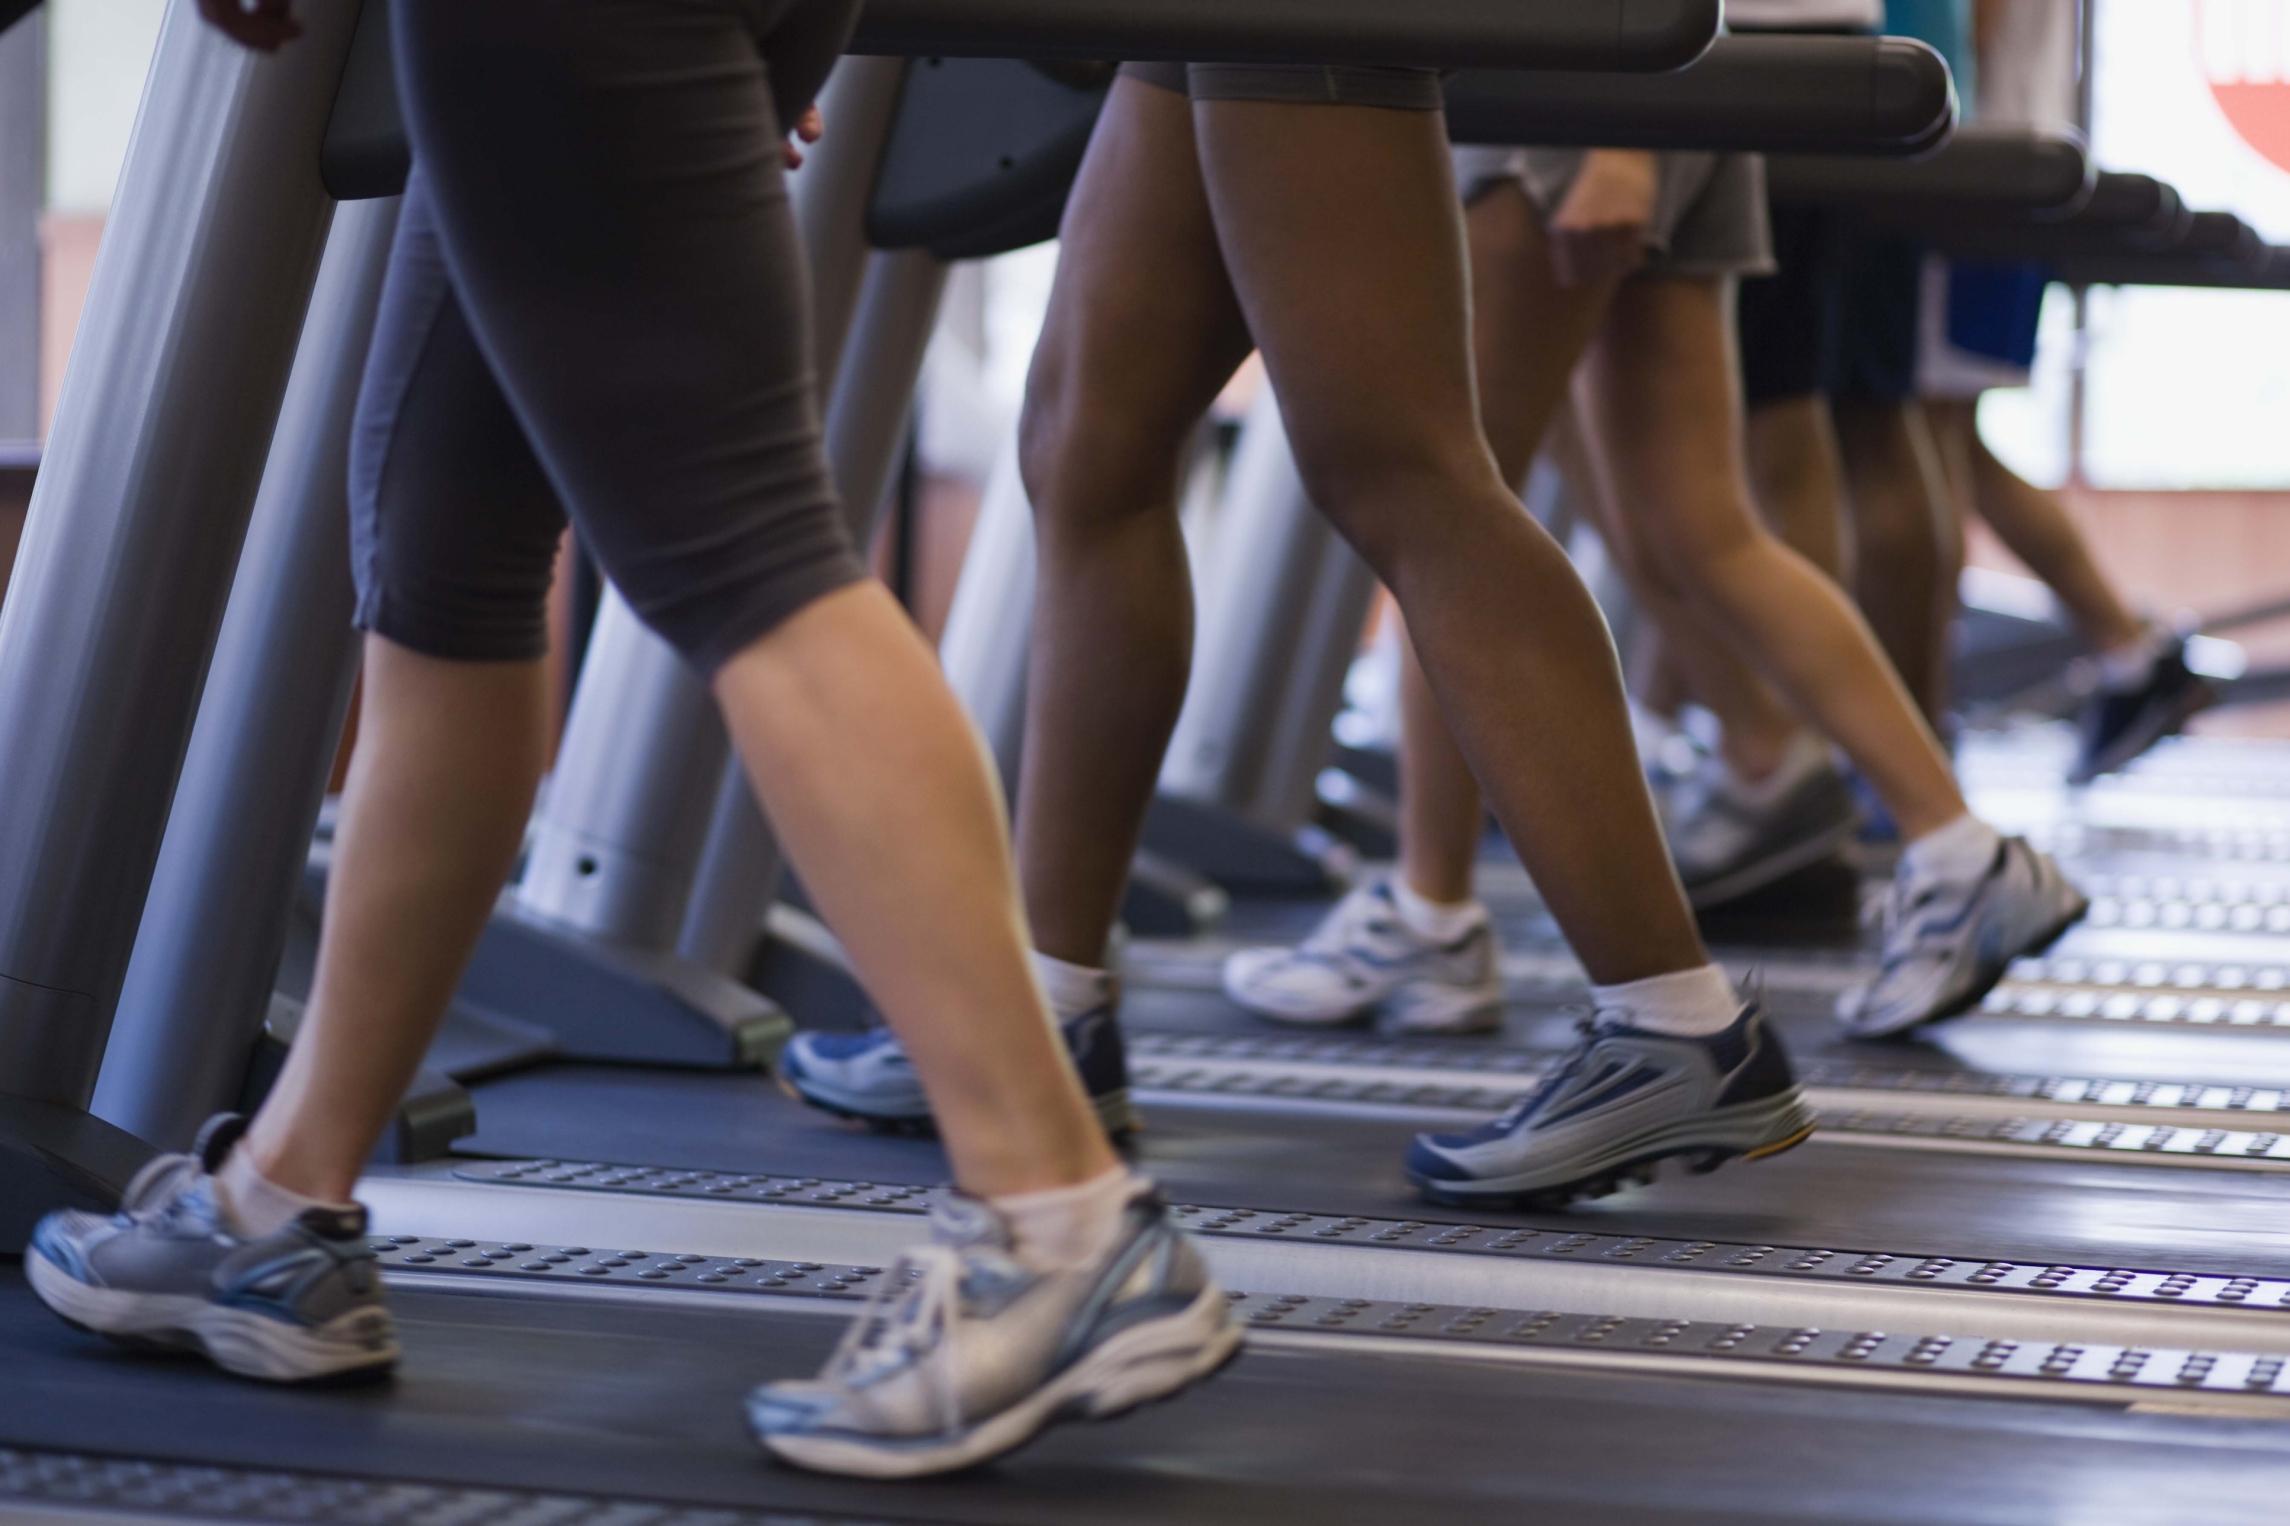 Peoples legs walking on treadmills